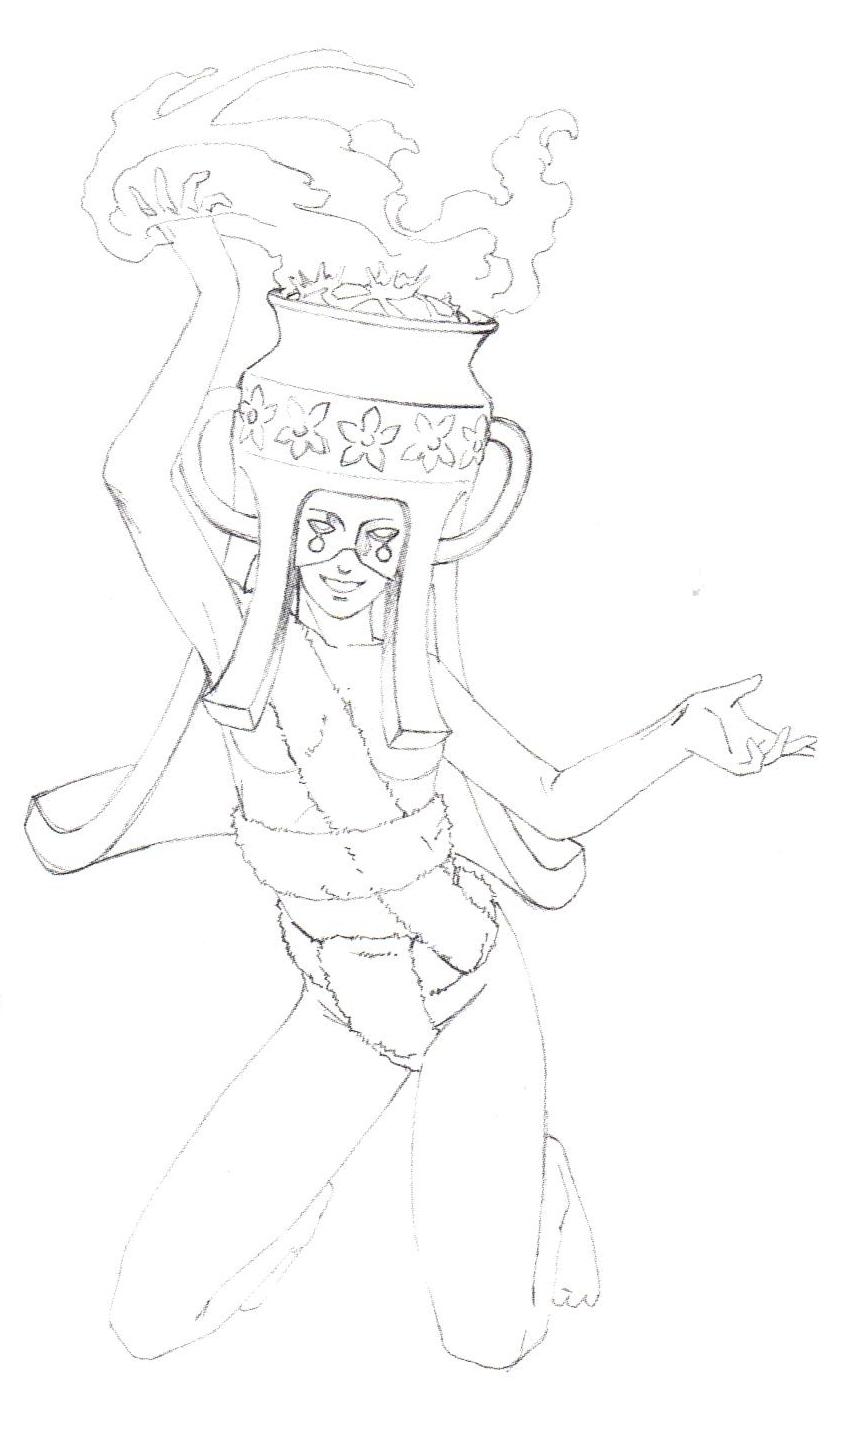 Pele - Megami Tensei Wiki: a Demonic Compendium of your